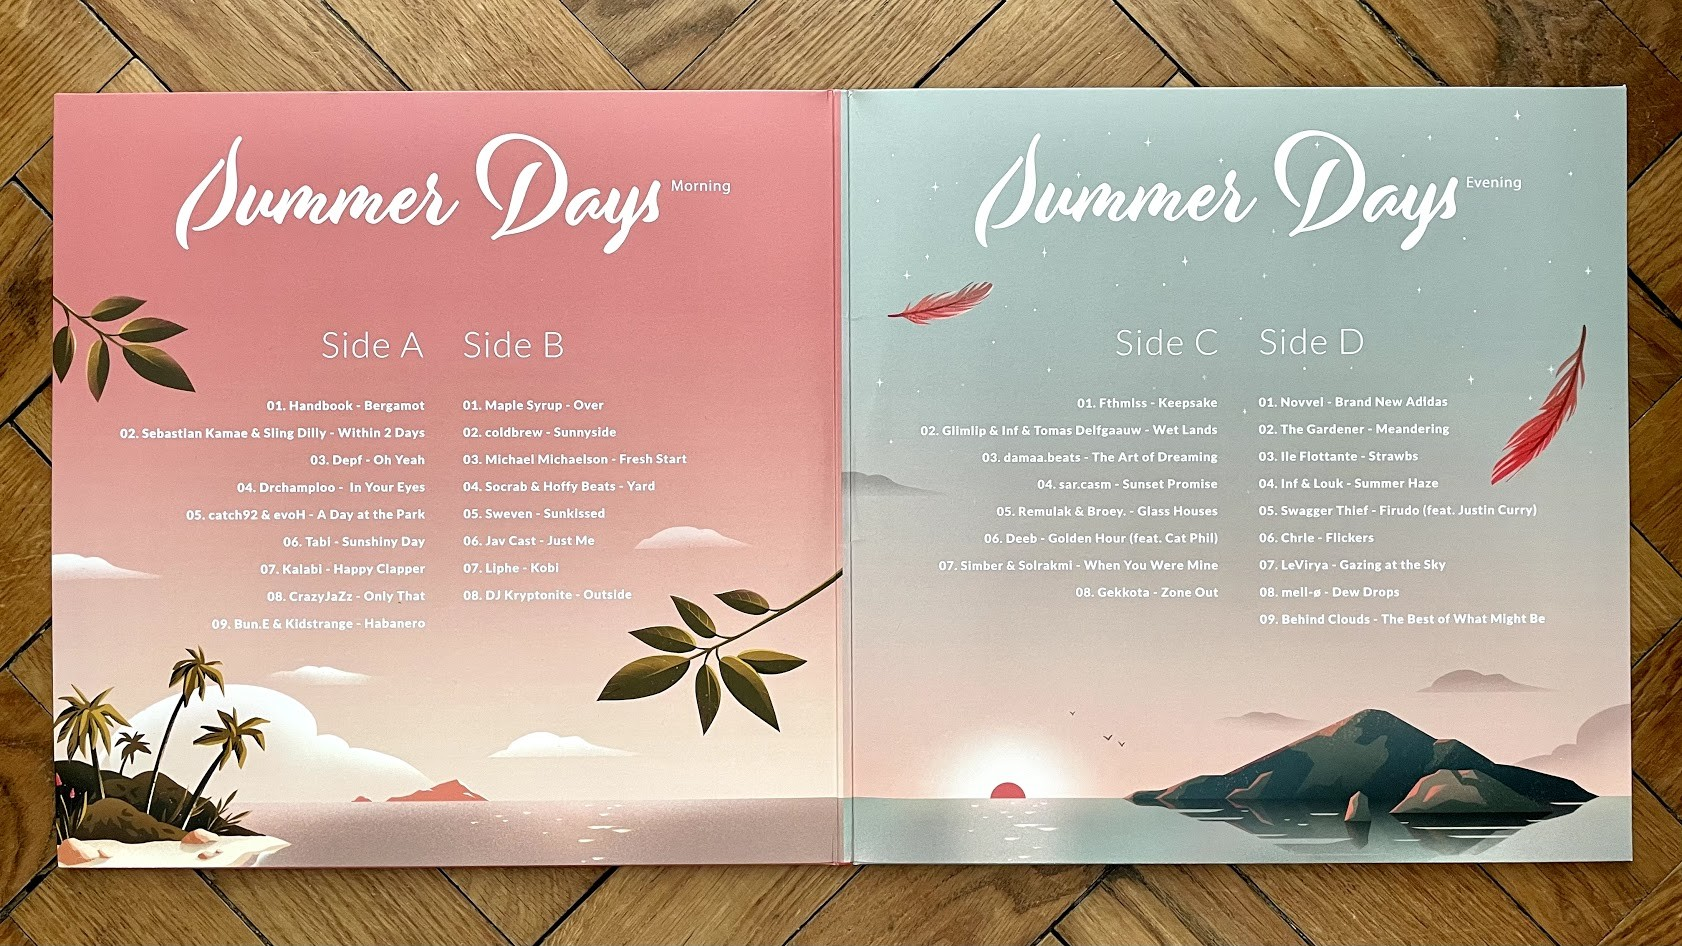 summer-days-aviary-day-gatefold-cover